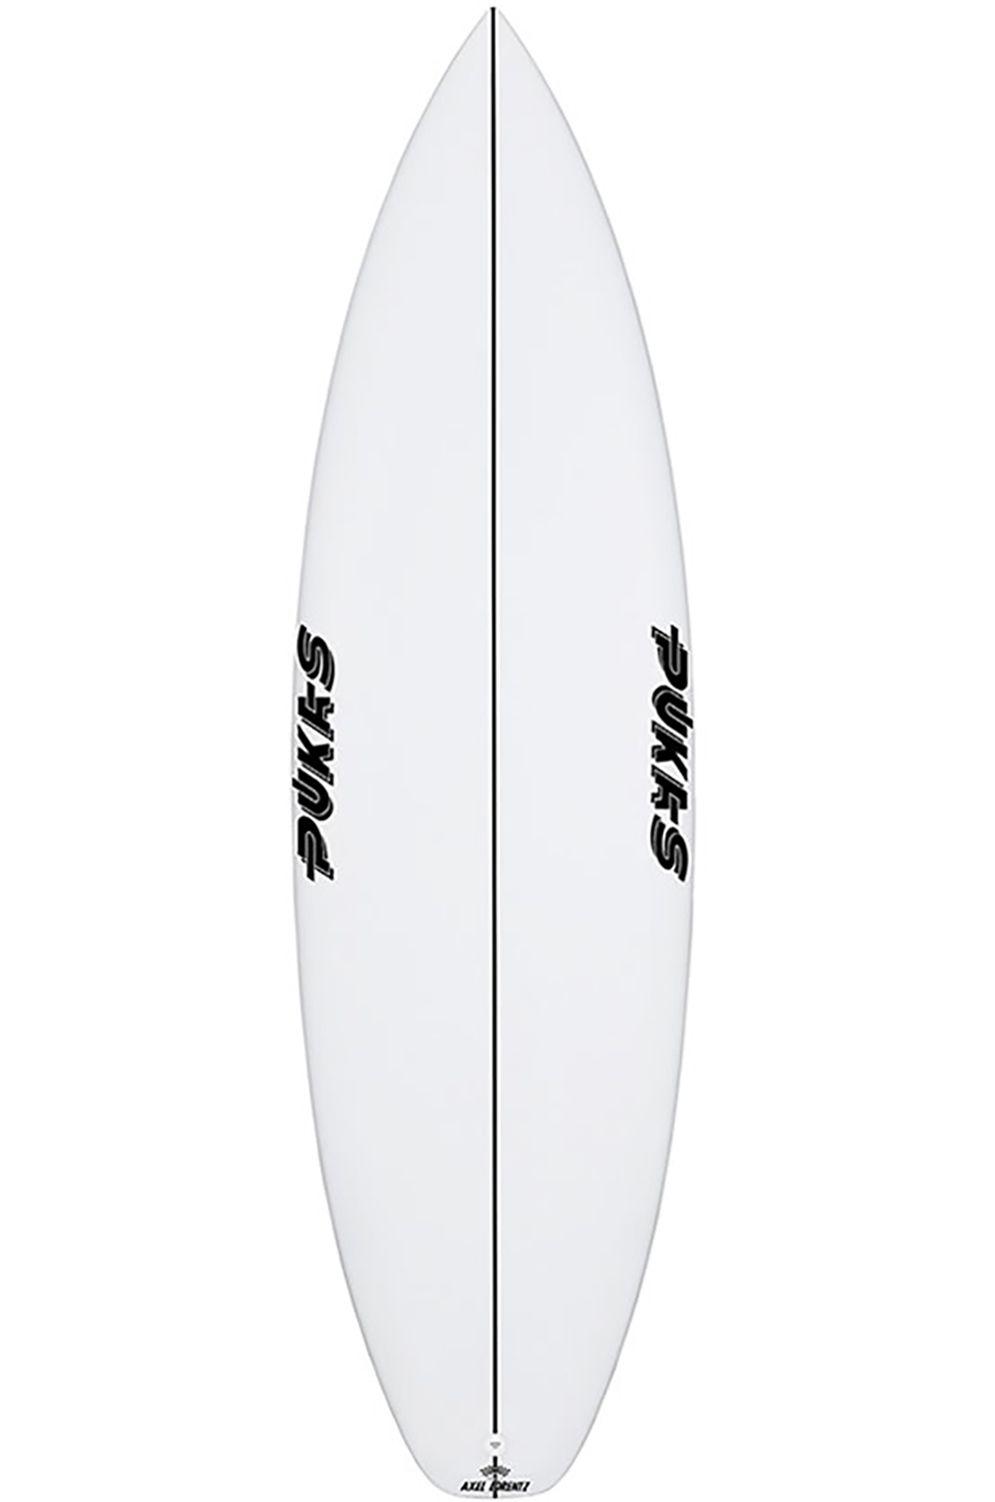 Pukas Surf Board 6'0 TASTY TREAT Squash Tail - White FCS II 6ft0